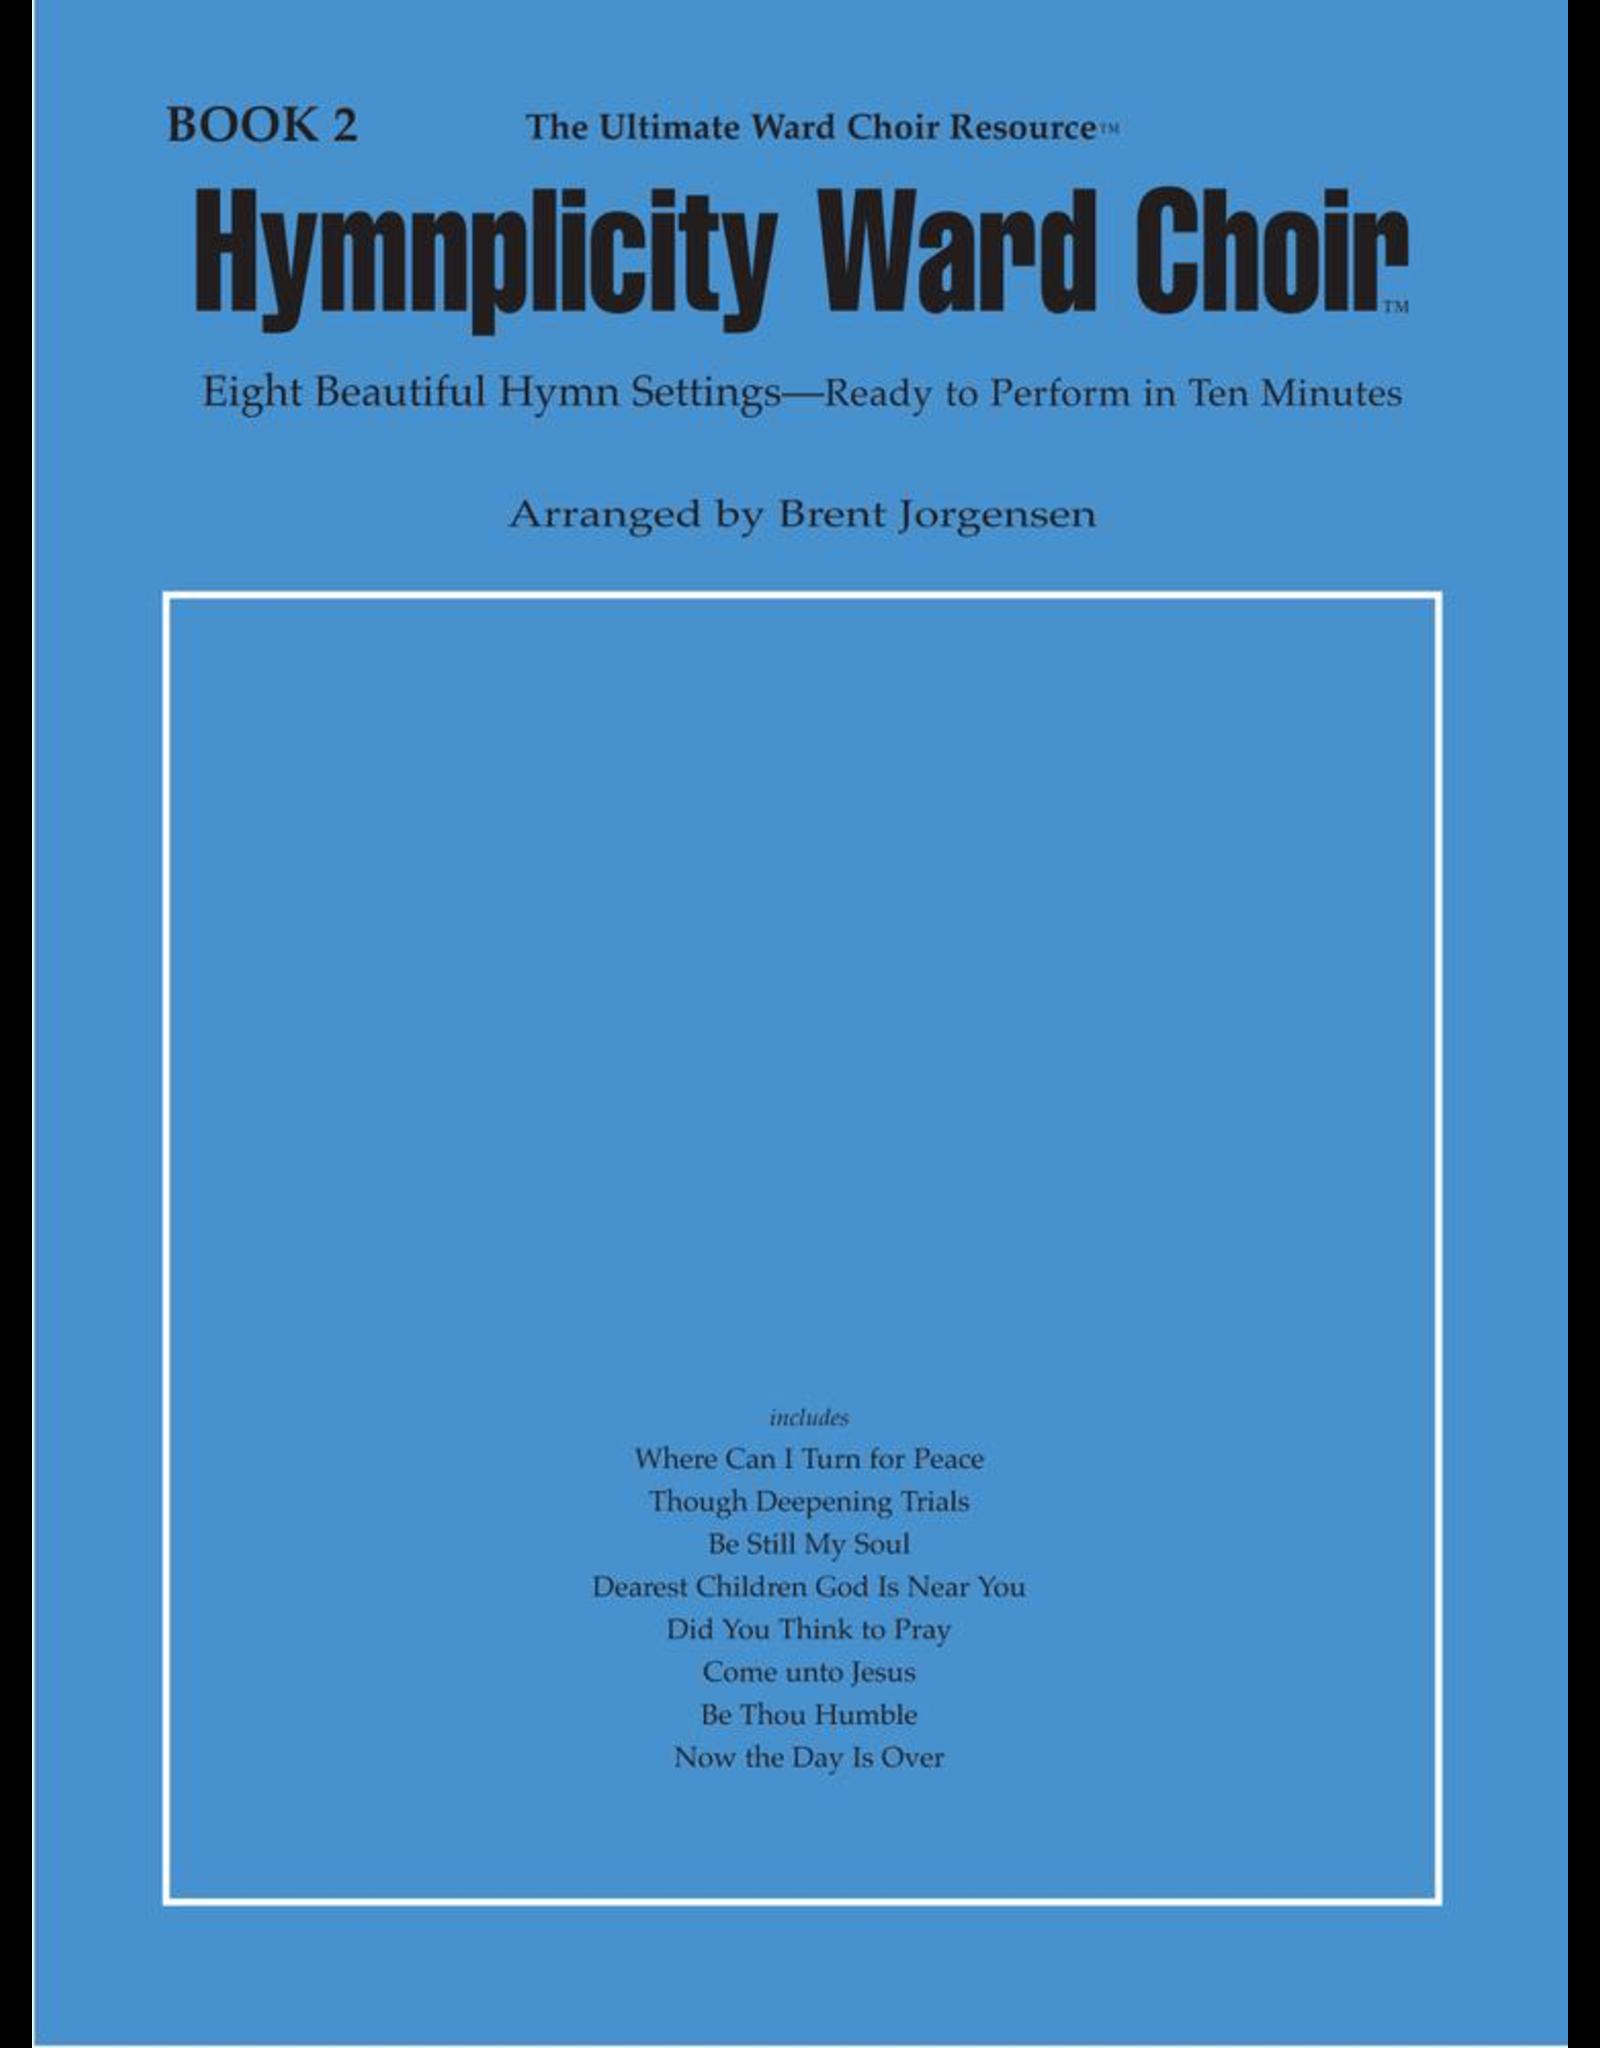 Jackman Music Hymnplicity Ward Choir, Book 2